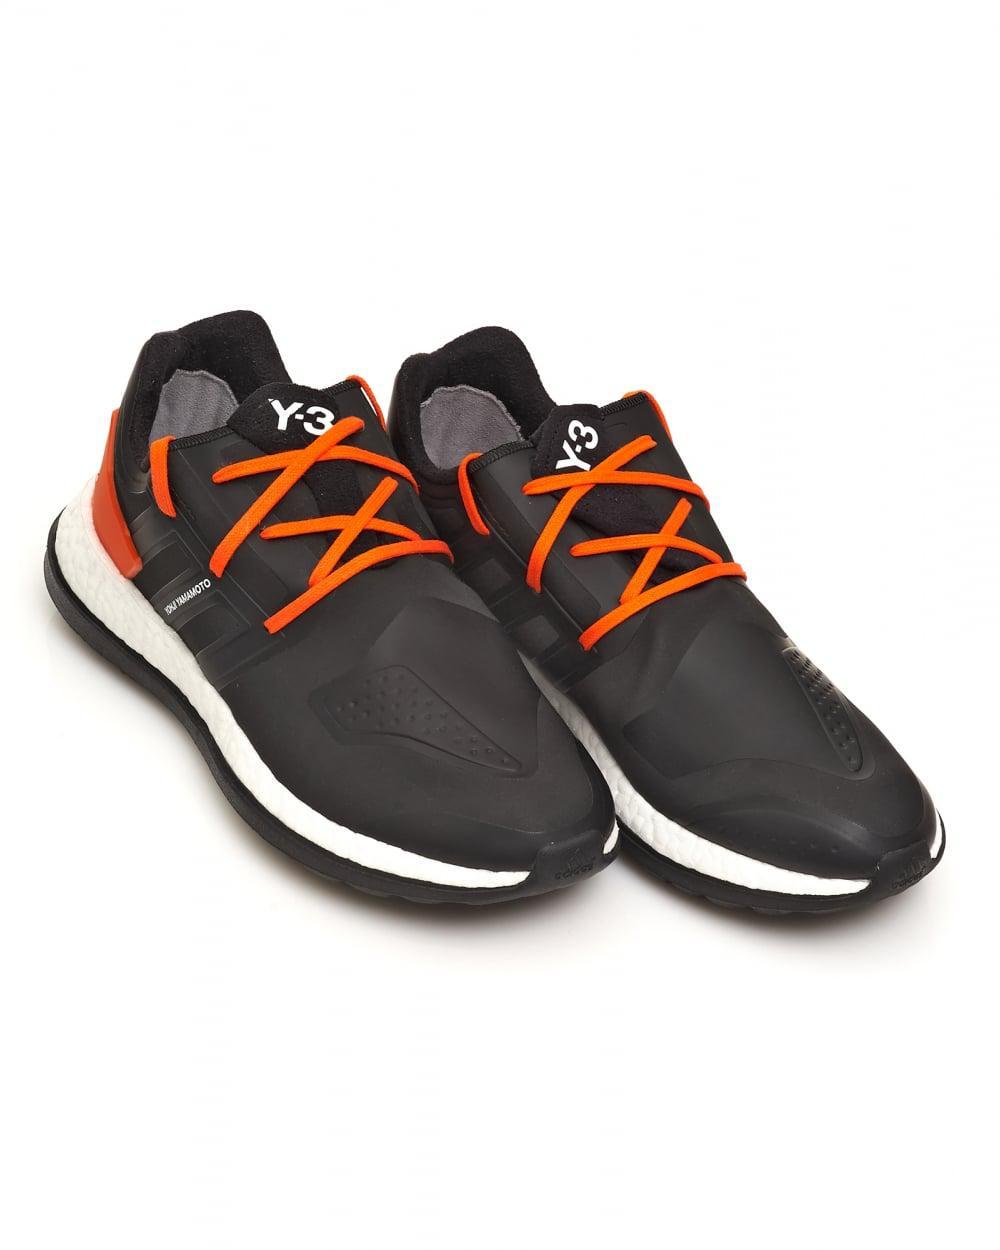 8c3db4c58a00b Lyst - Y-3 Pure Boost Zg Neoprene Black And Orange Trainers in Black ...